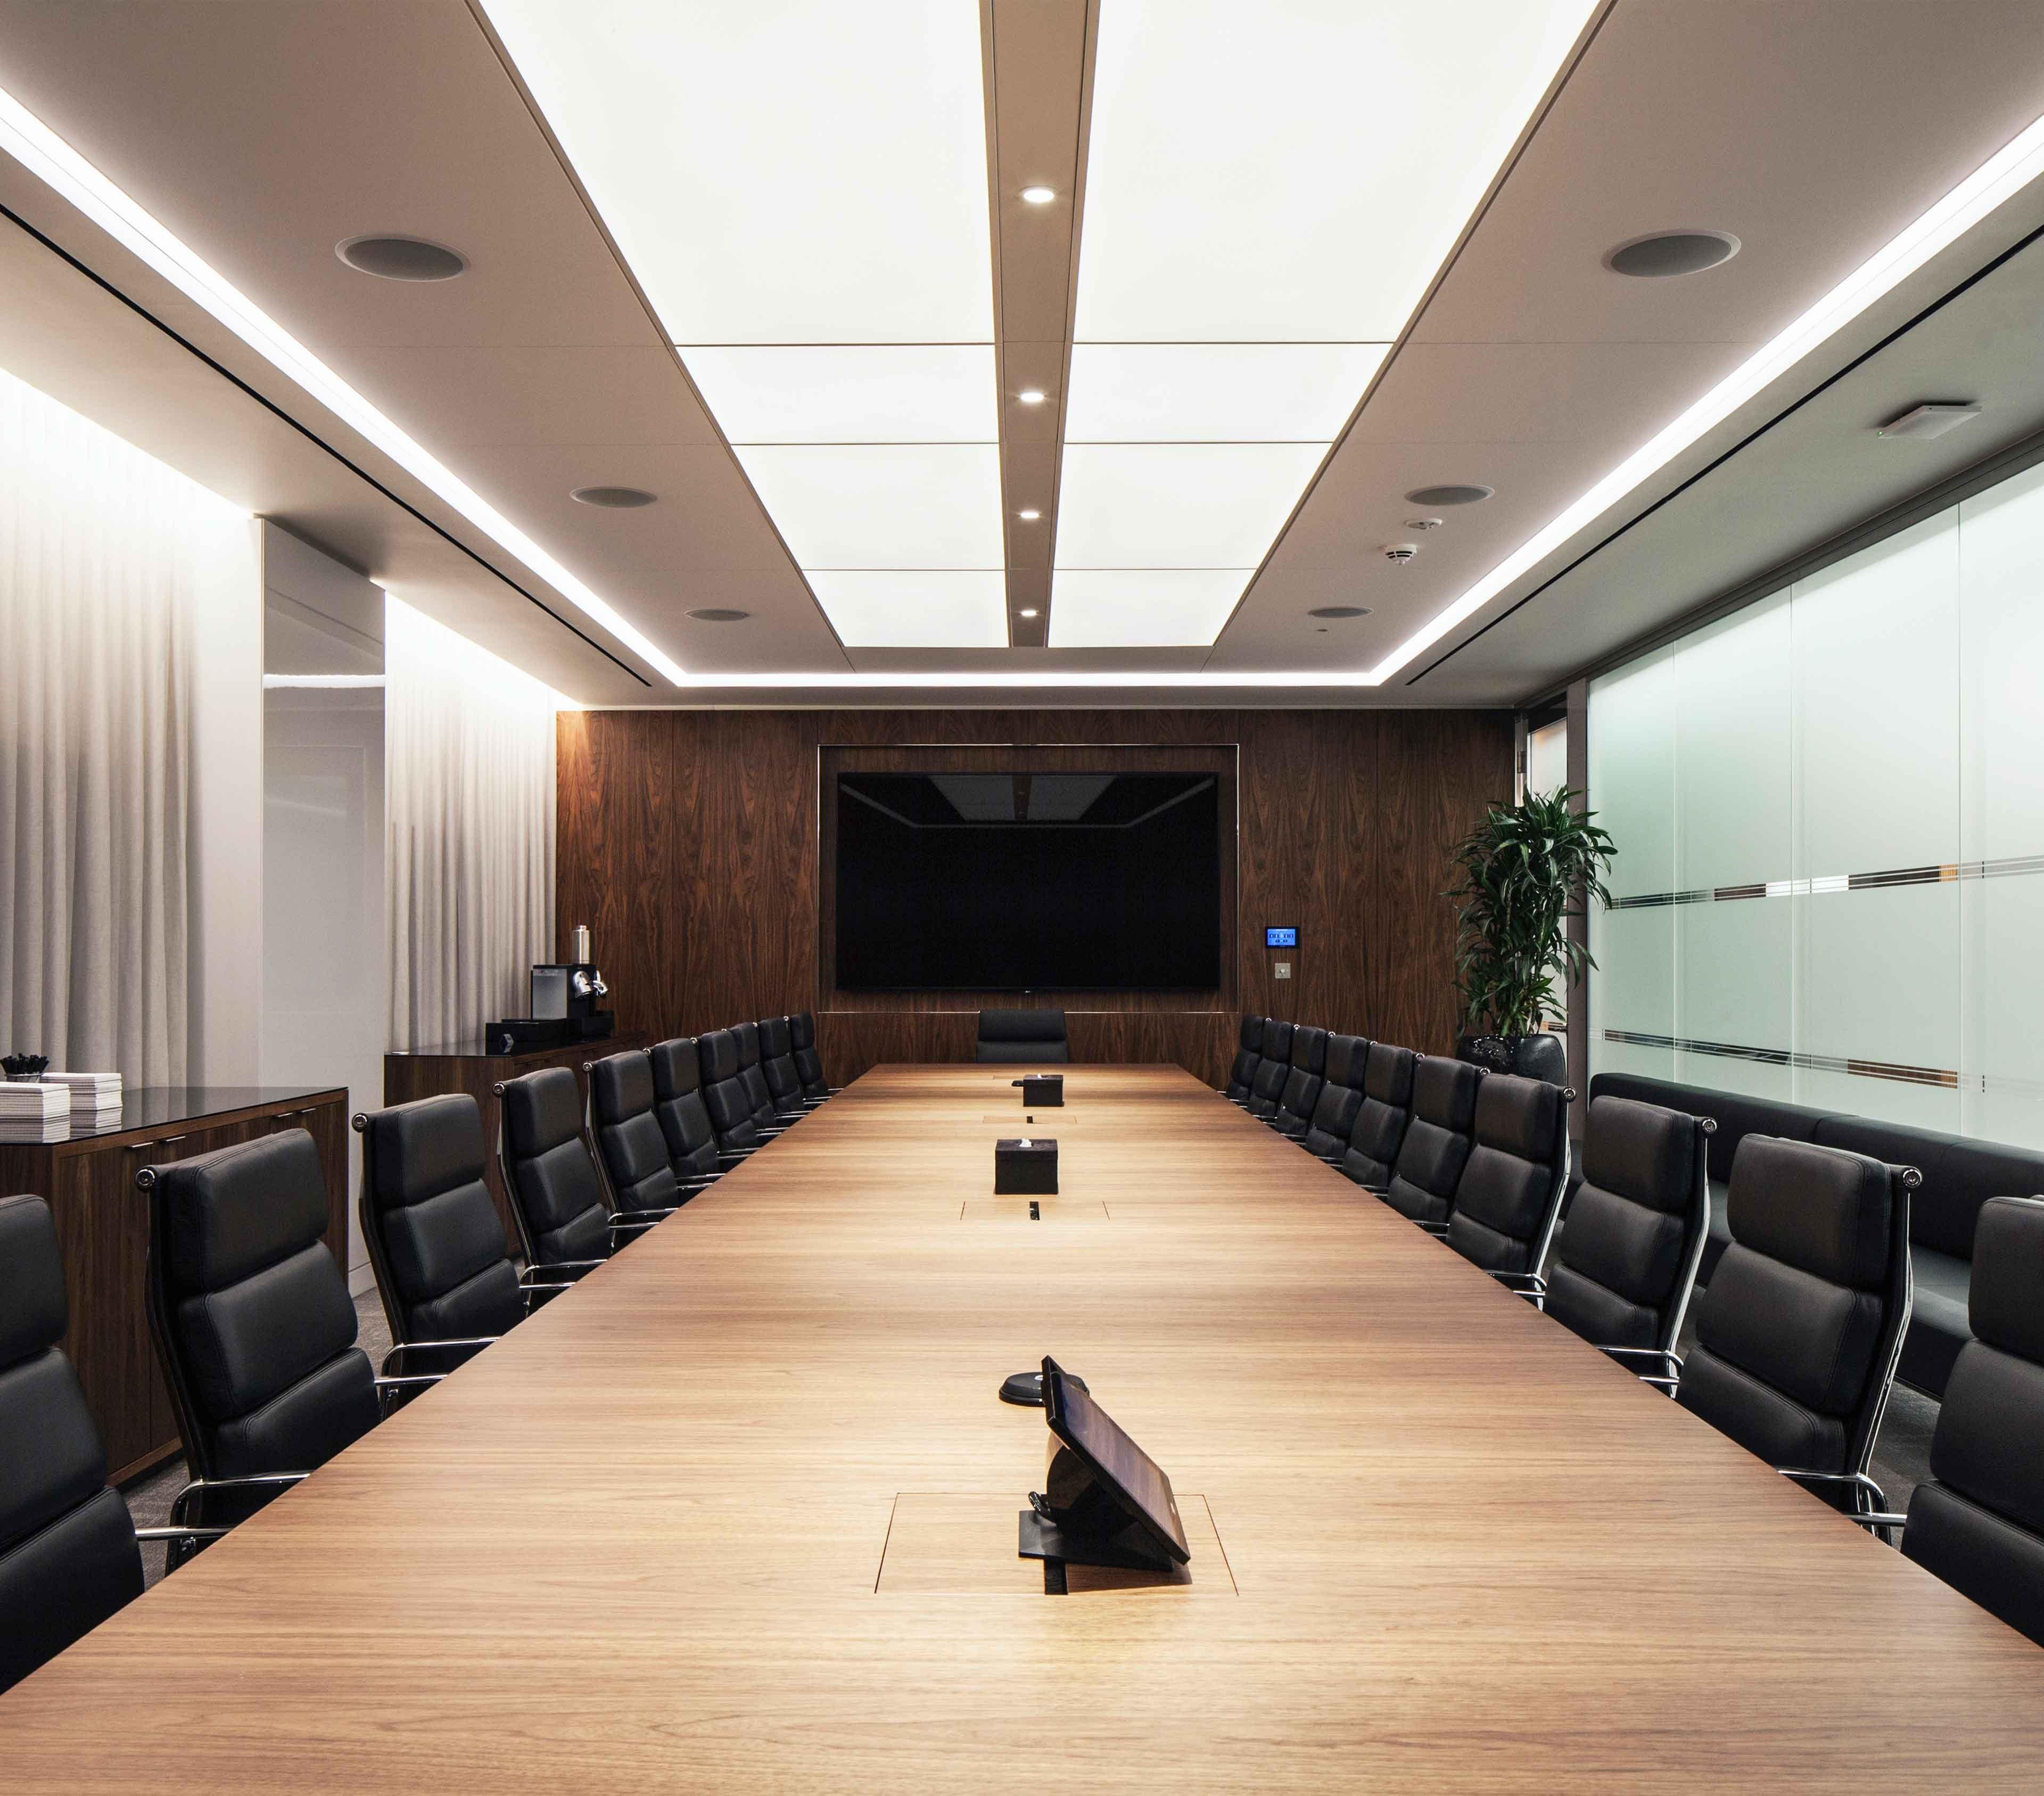 اهمیت نورپردازی در سالن کنفرانس